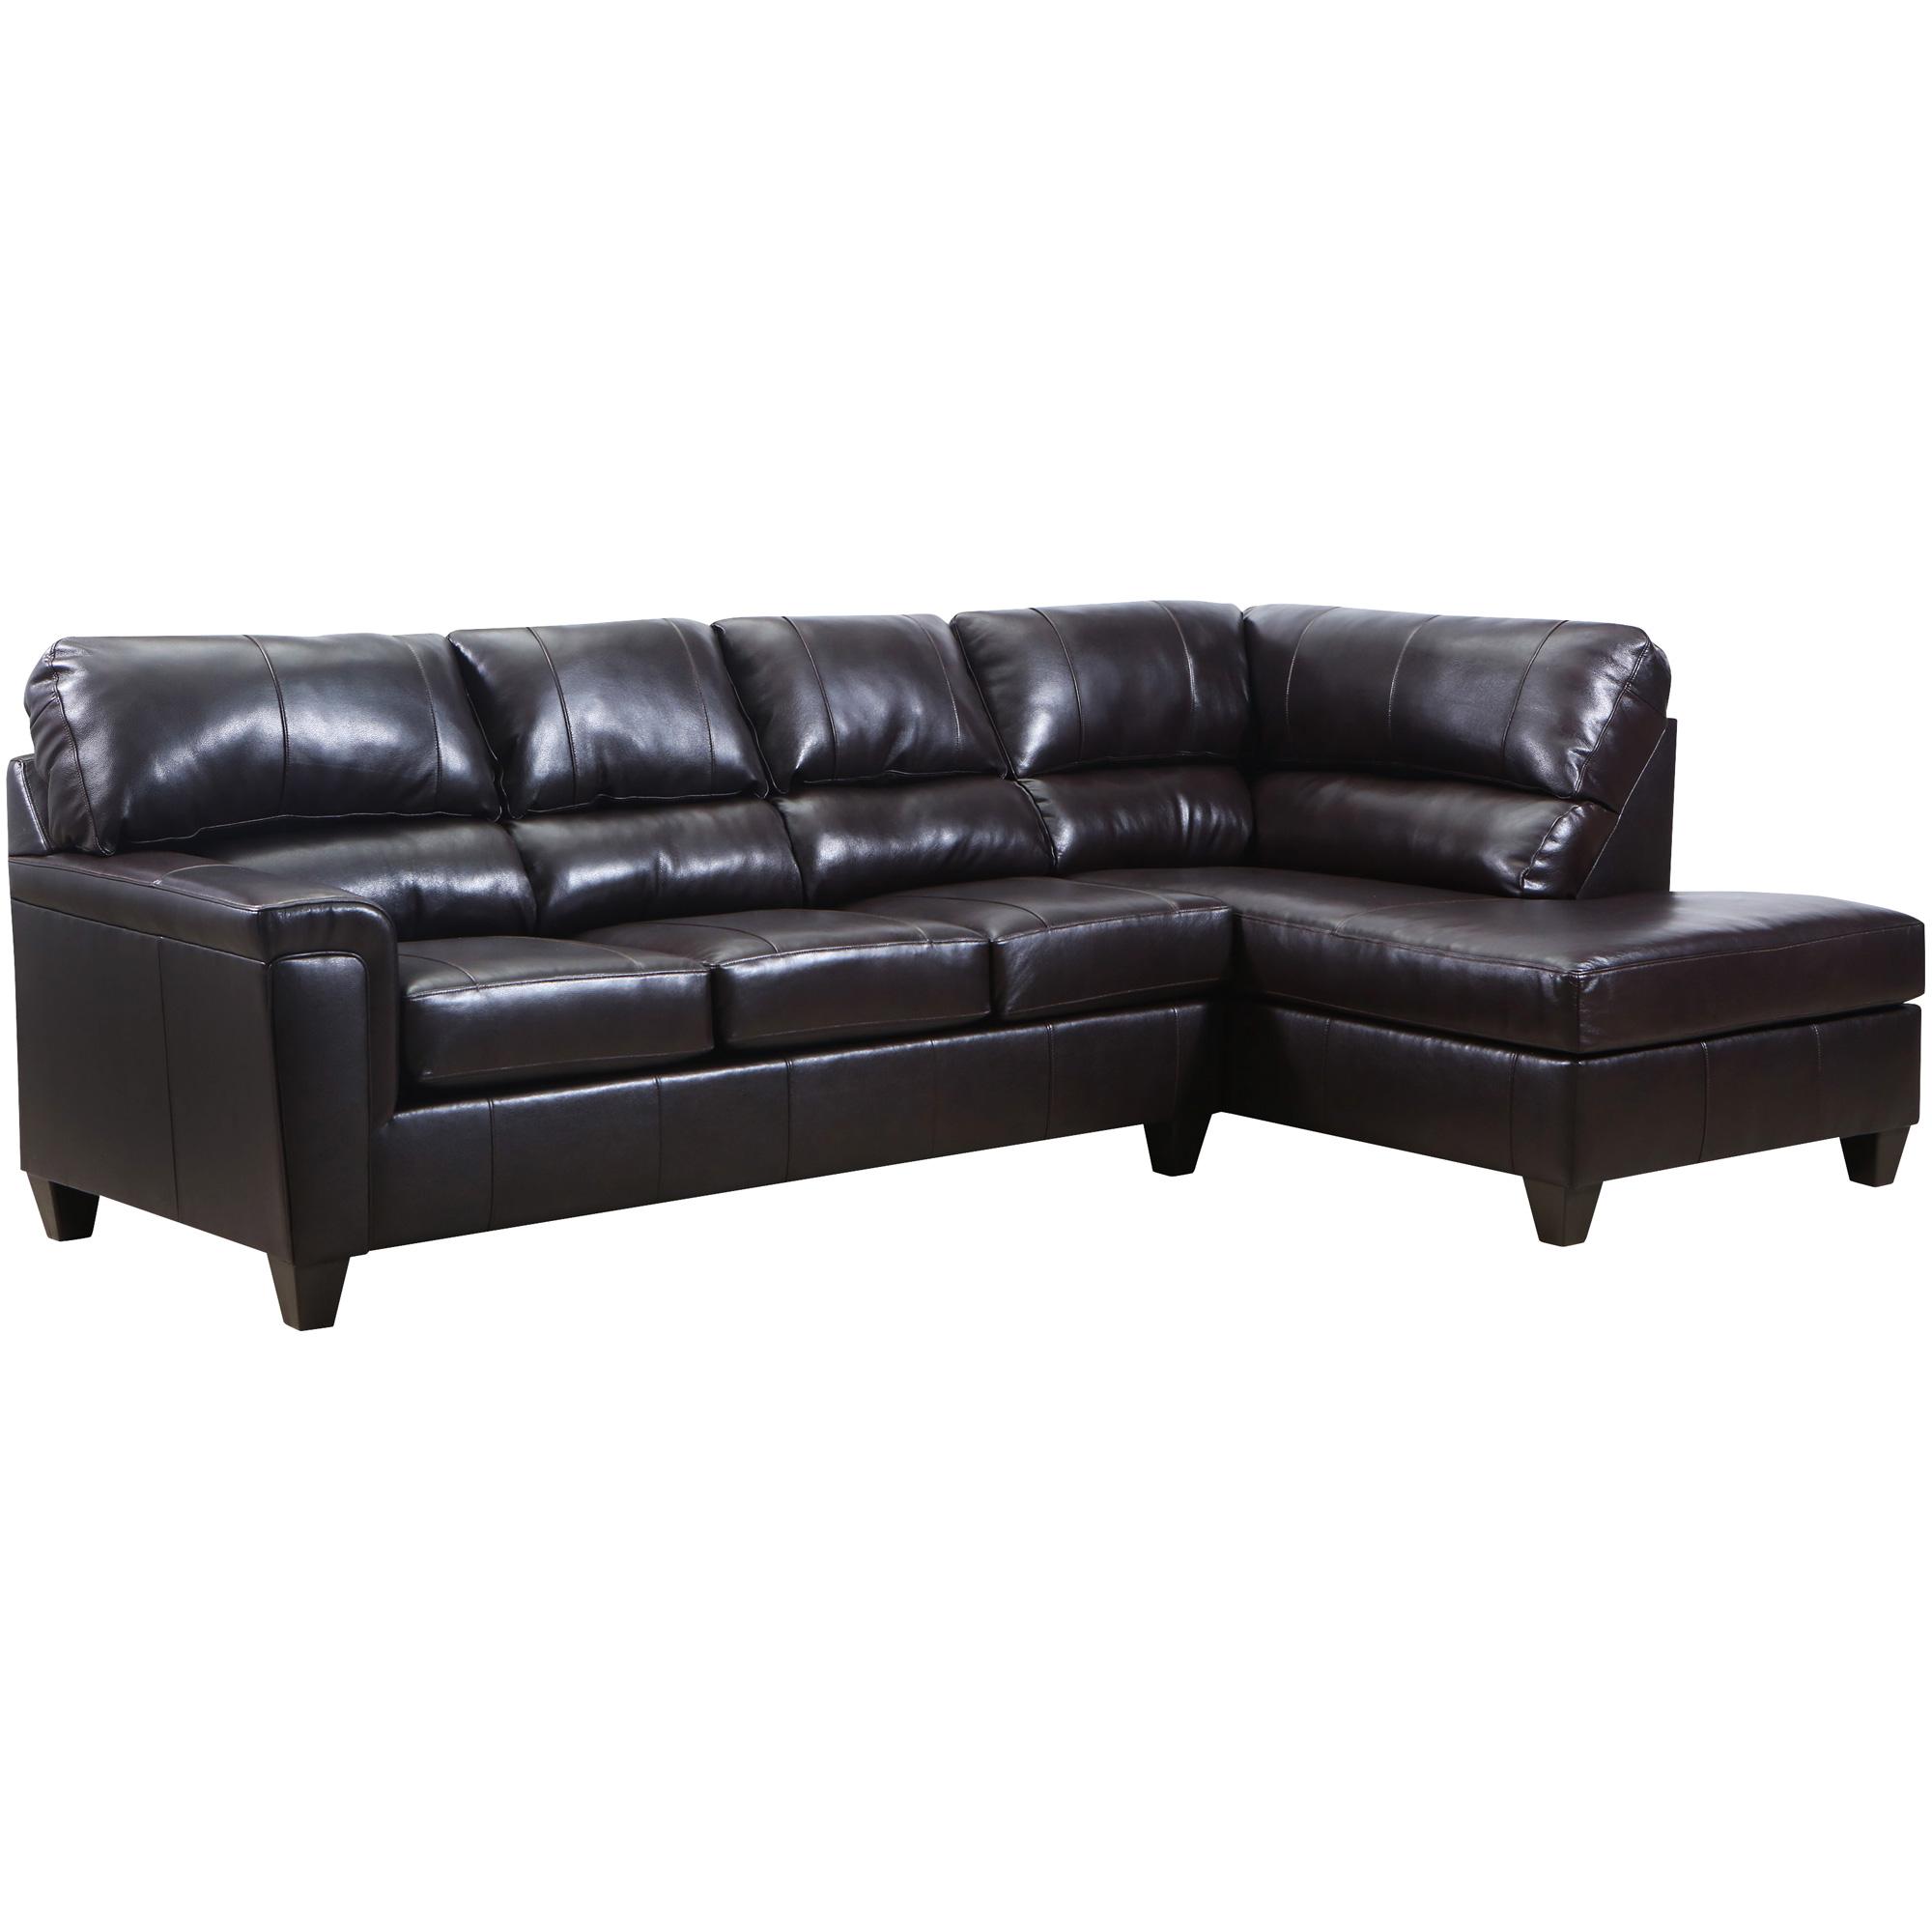 Lane Furniture | Barnes Bark Right Chaise Sectional Sofa